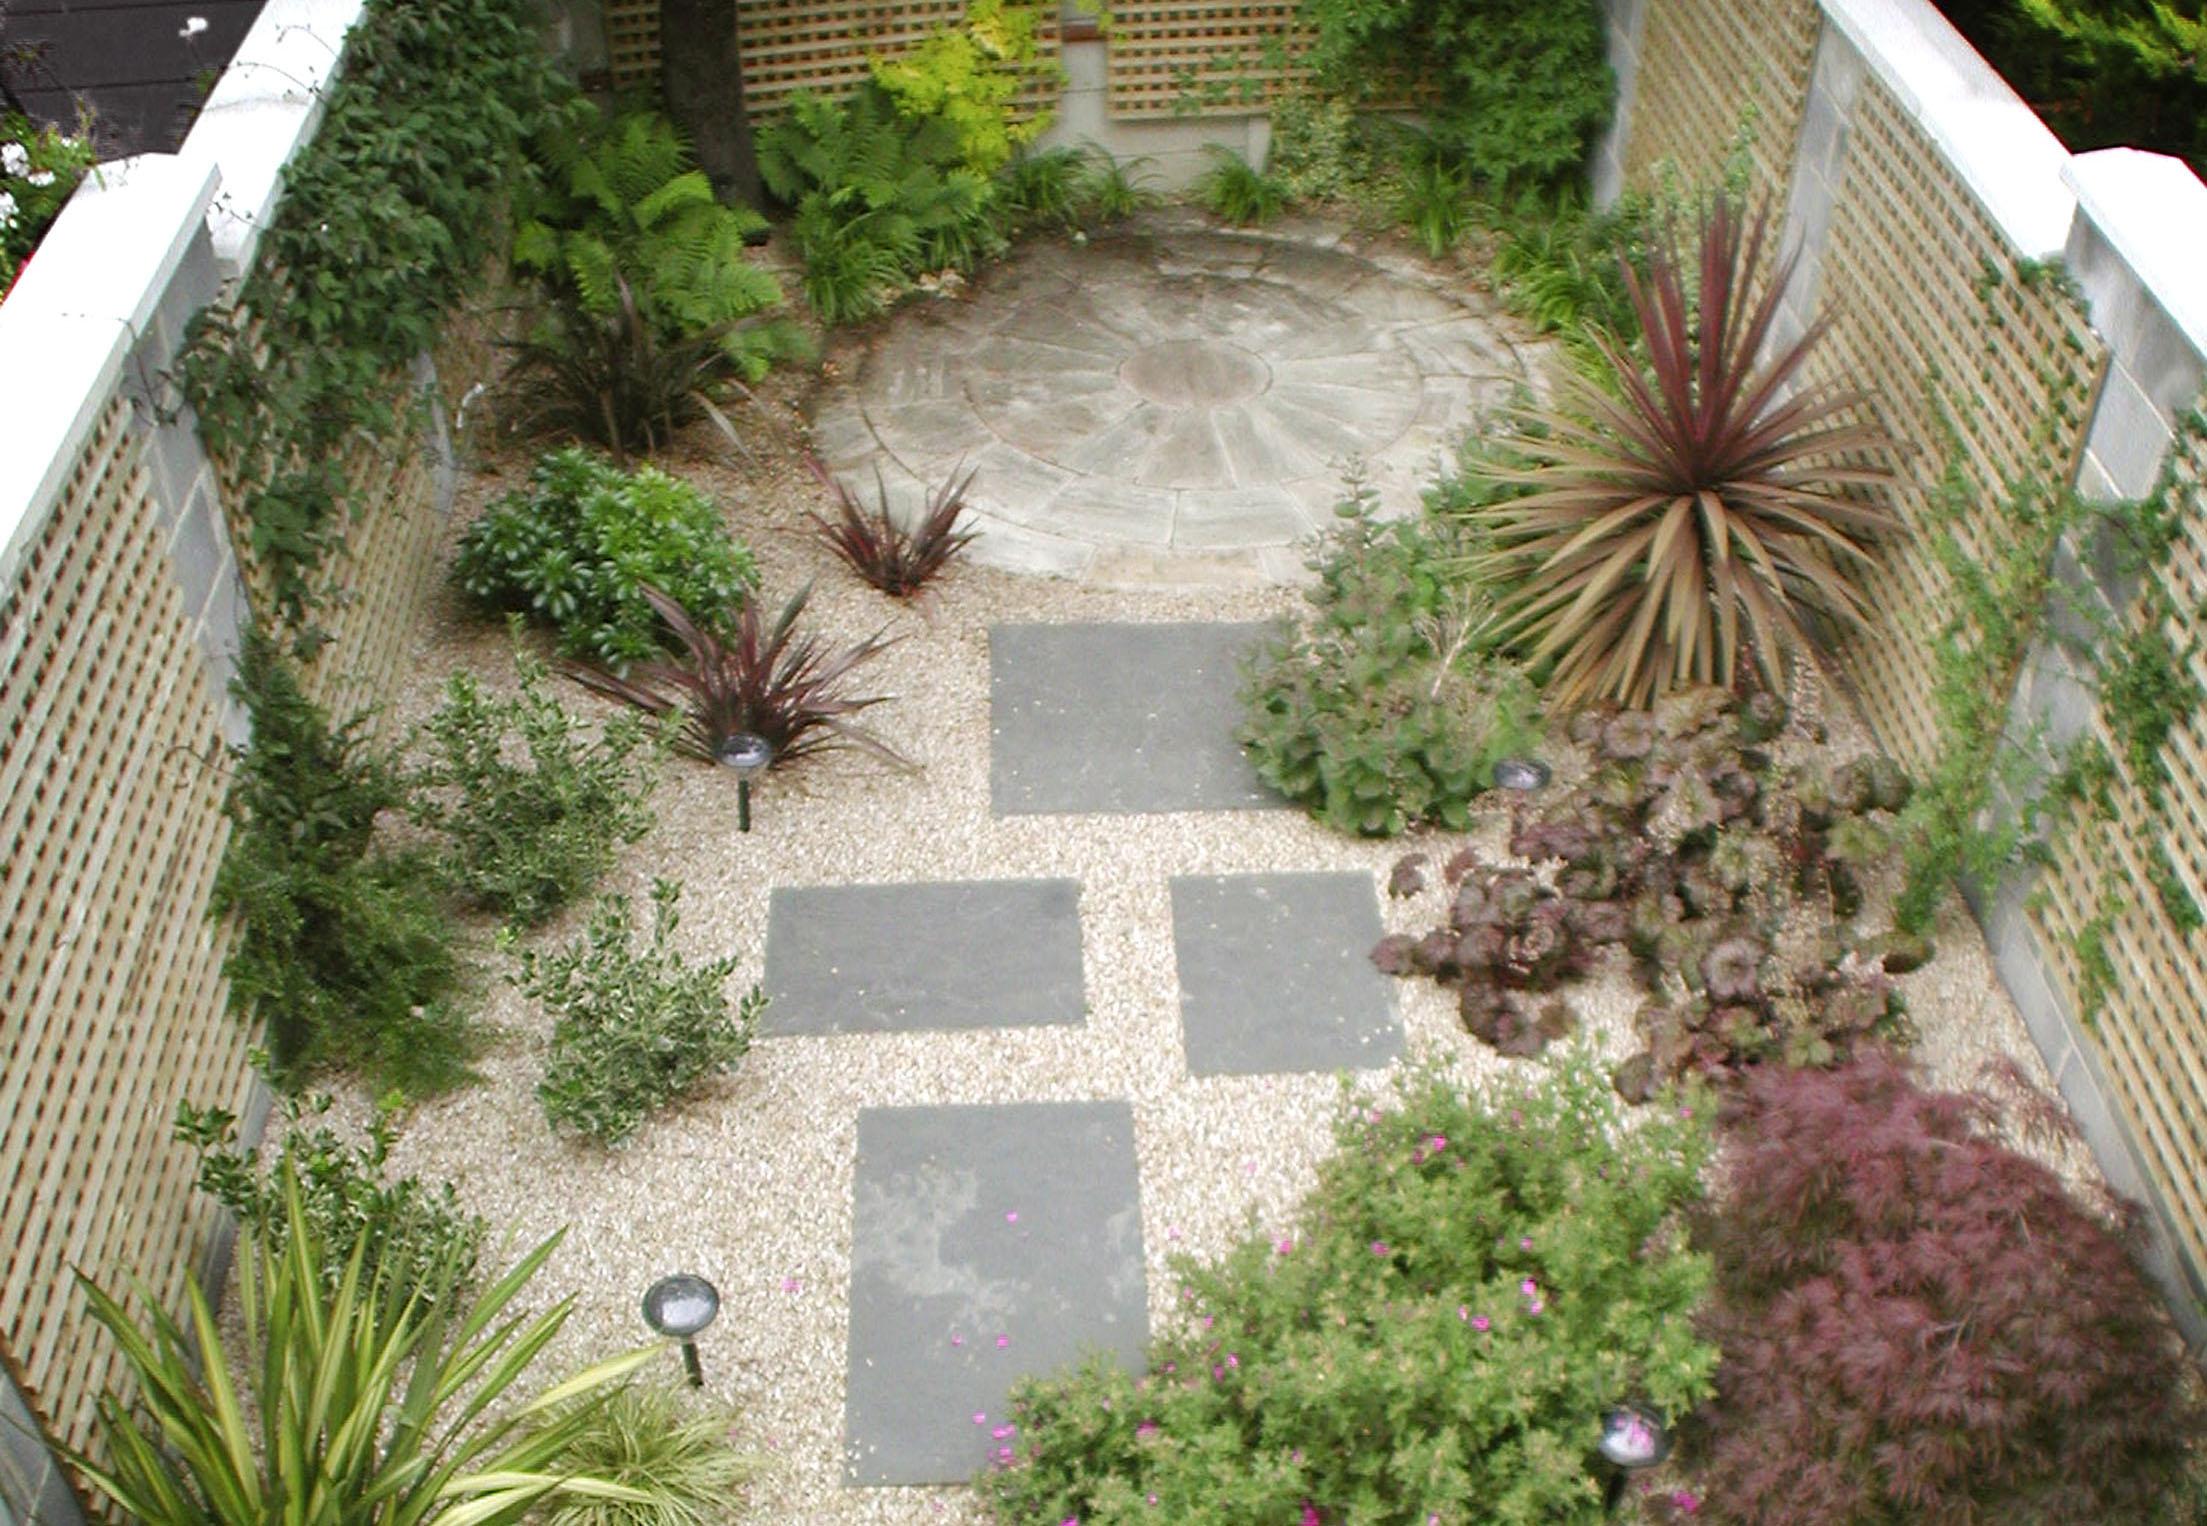 Landscaping Garden Design Project Stillorgan, Dublin, Ireland